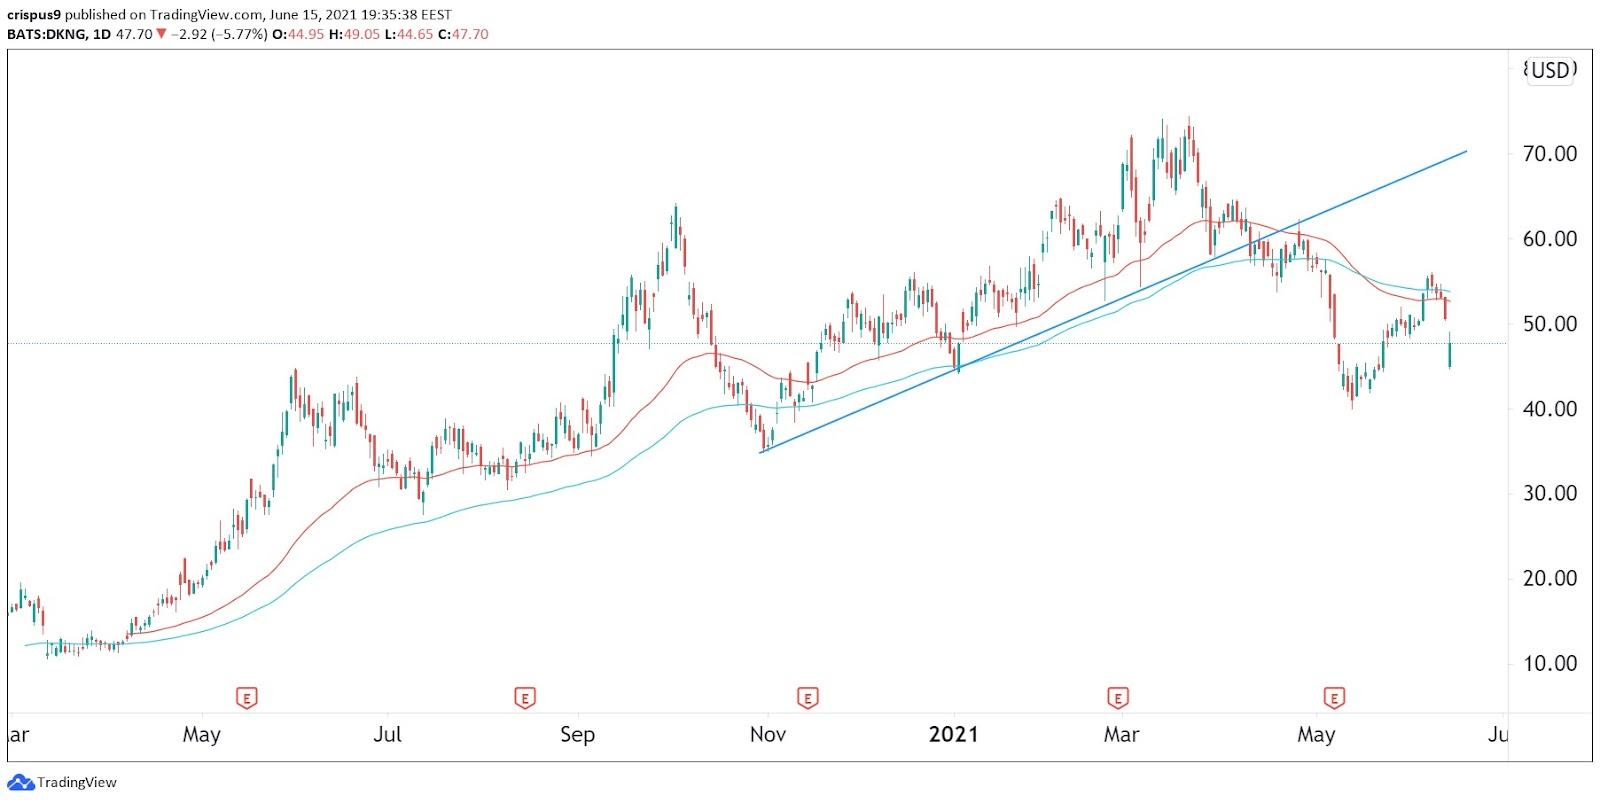 DraftKings stock price